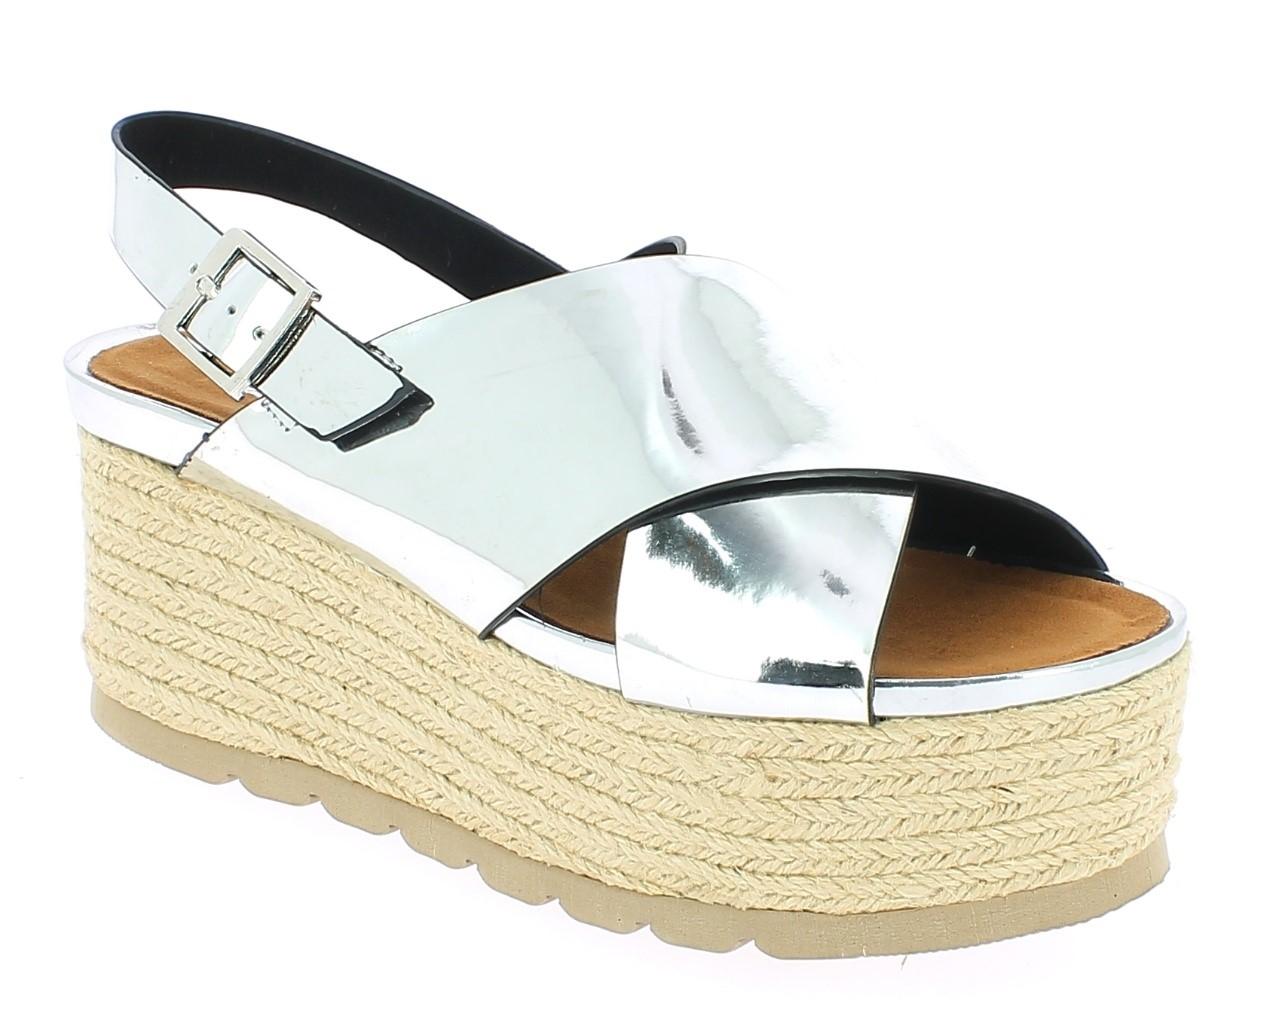 16653ec0960 Αυτό το καλοκαίρι, μη νοιάζεστε για το πόσα χρήματα θα πληρώσετε για τα  παπούτσια της οικογένειάς σας. Έχει φροντίσει το www.iqshoes.gr να έχει τις  ...